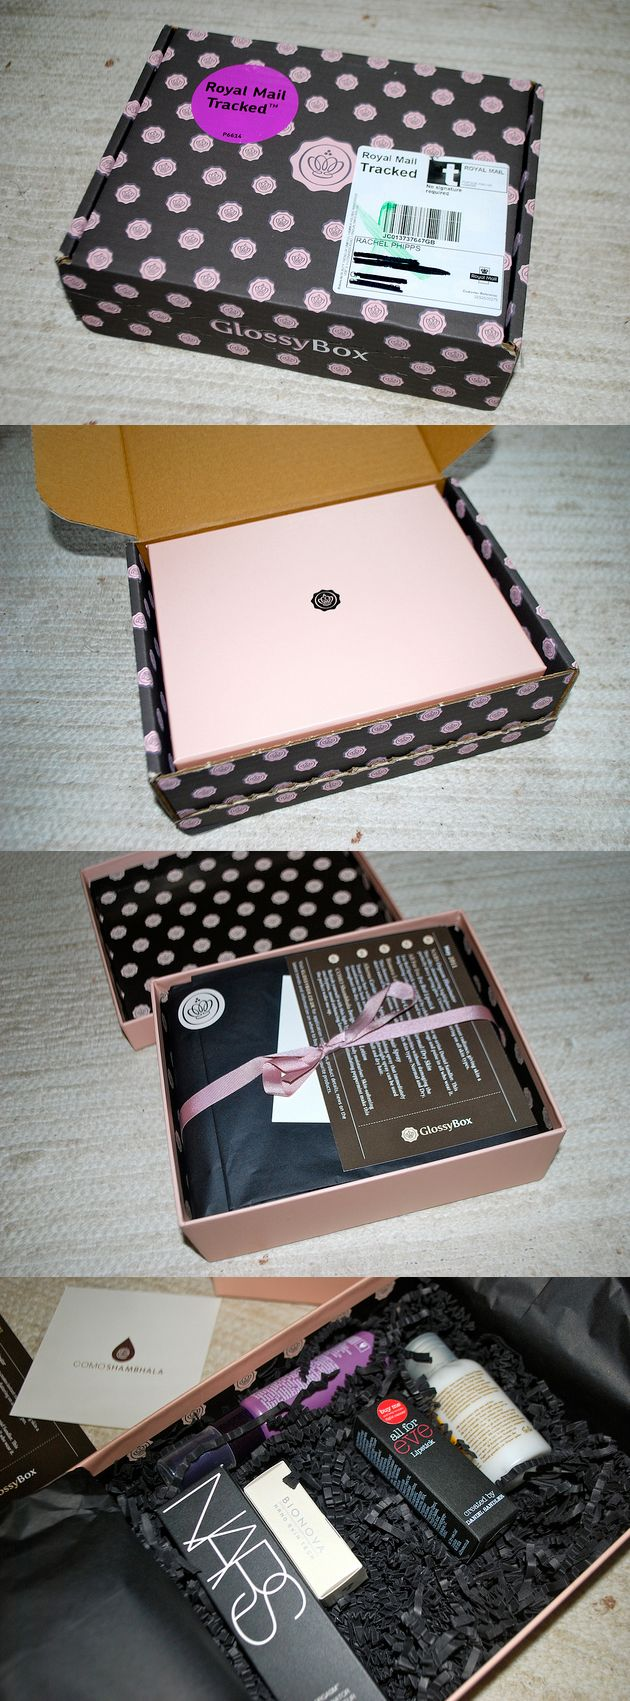 Folded box packaging. seal with big logo sticker?   Inside: small emblem sticker, ribbon.    Glossy box.